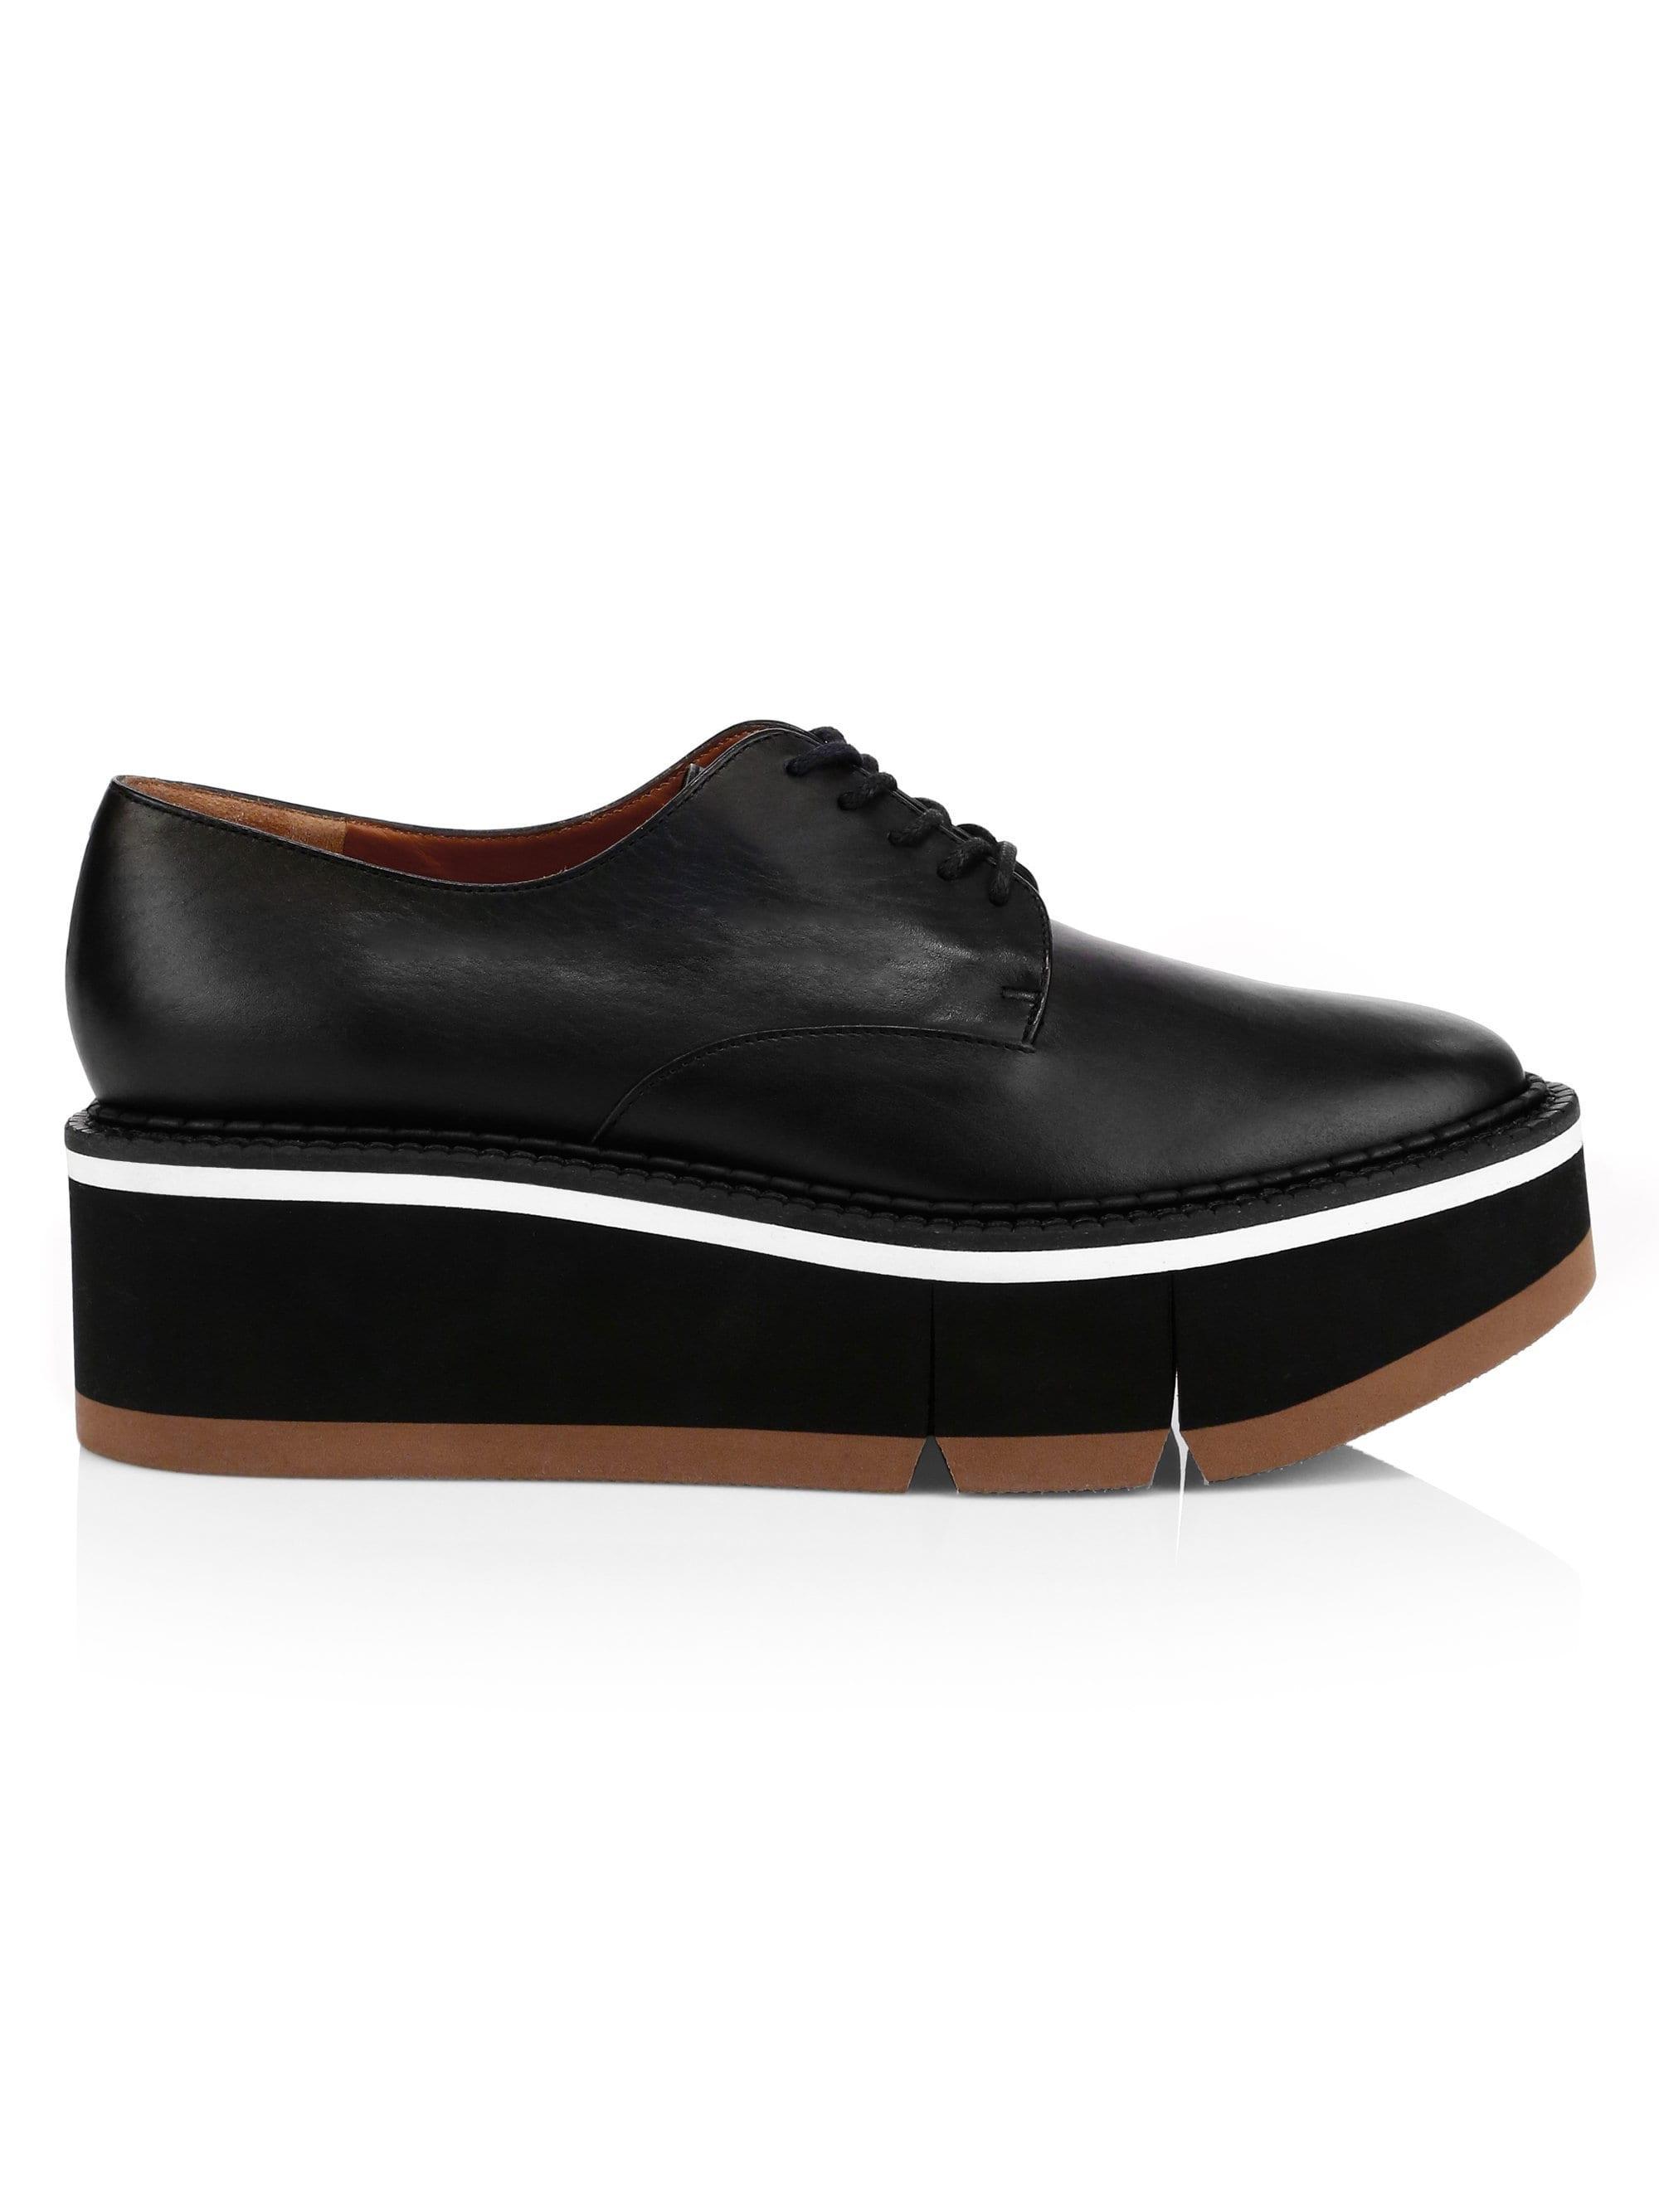 7abfae935827 Lyst - Clergerie Barabara Leather Flatform Oxfords in Black